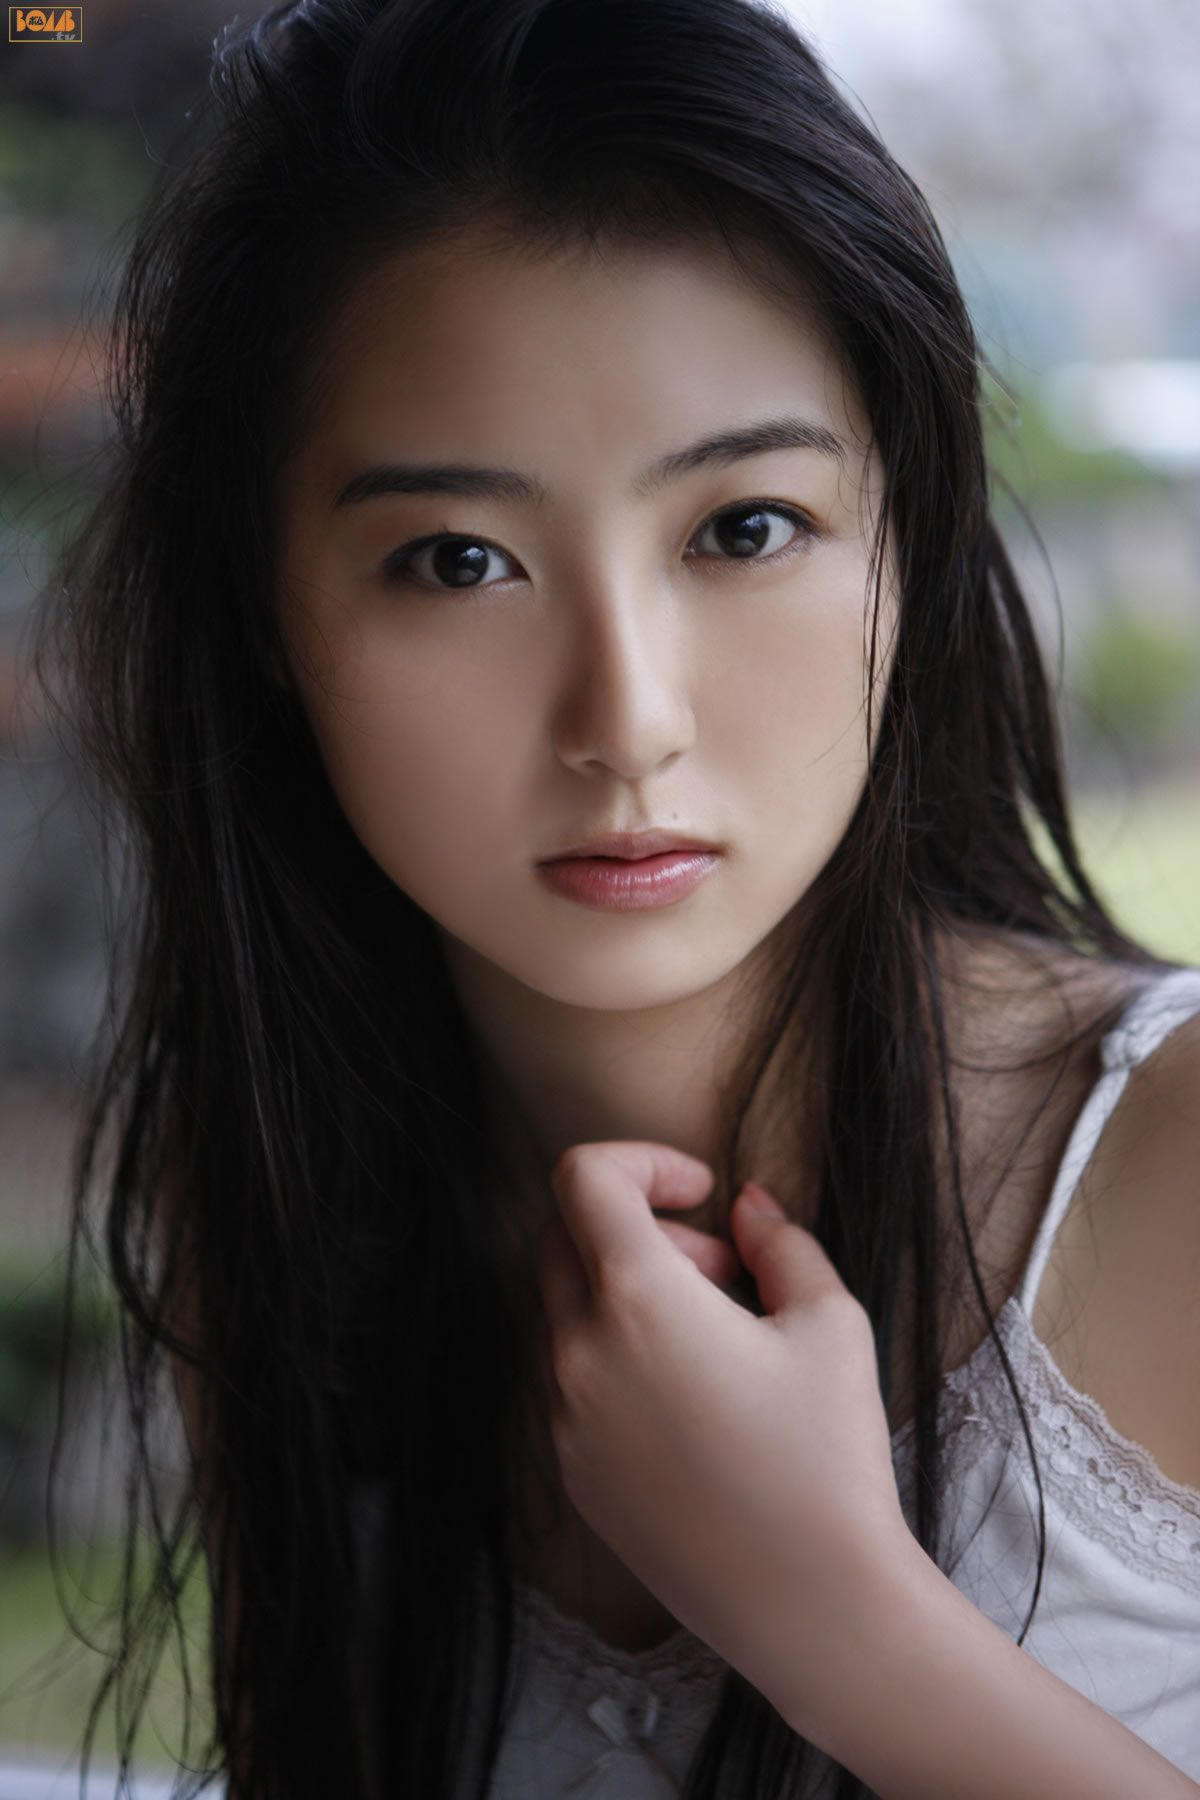 Kitano Nozomi 北野のぞみ それはすぐに私は行くべきである O O Upload: Nozomi Kitano WIPGravure Kitchen T Asian Gravure